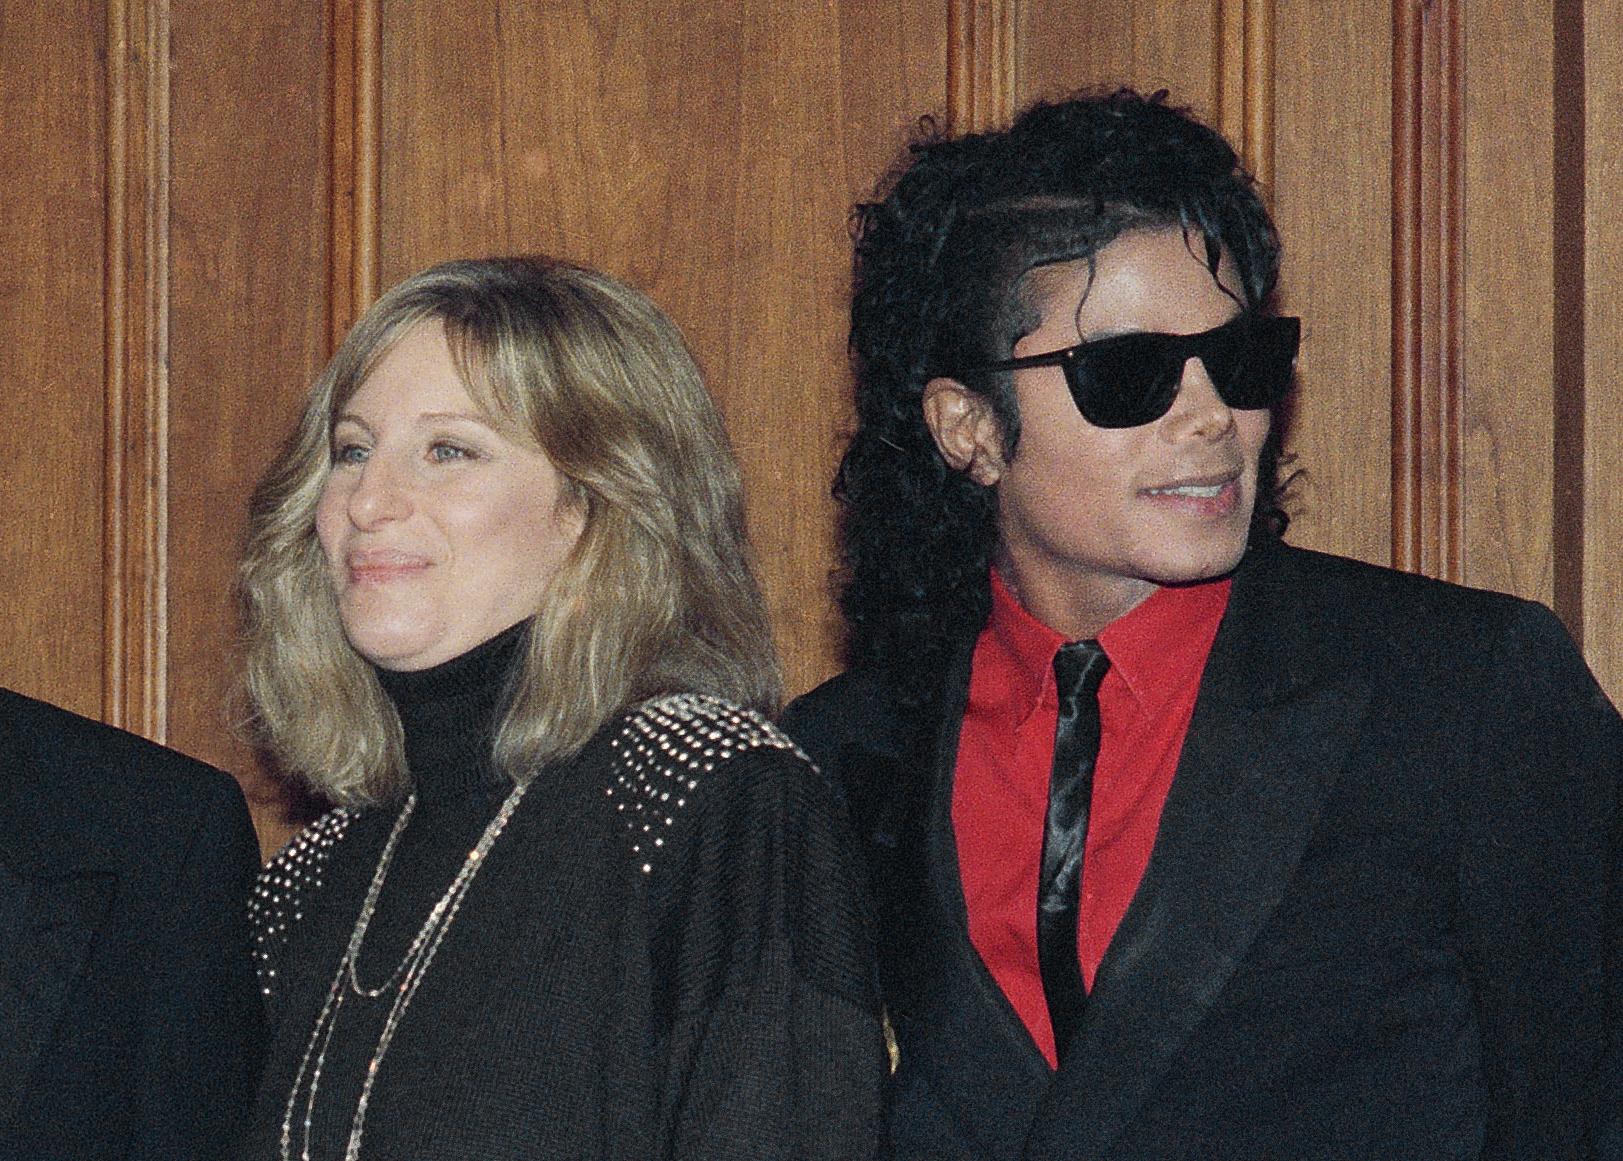 Streisand_Michael_Jackson_71424-159532.jpg59450822